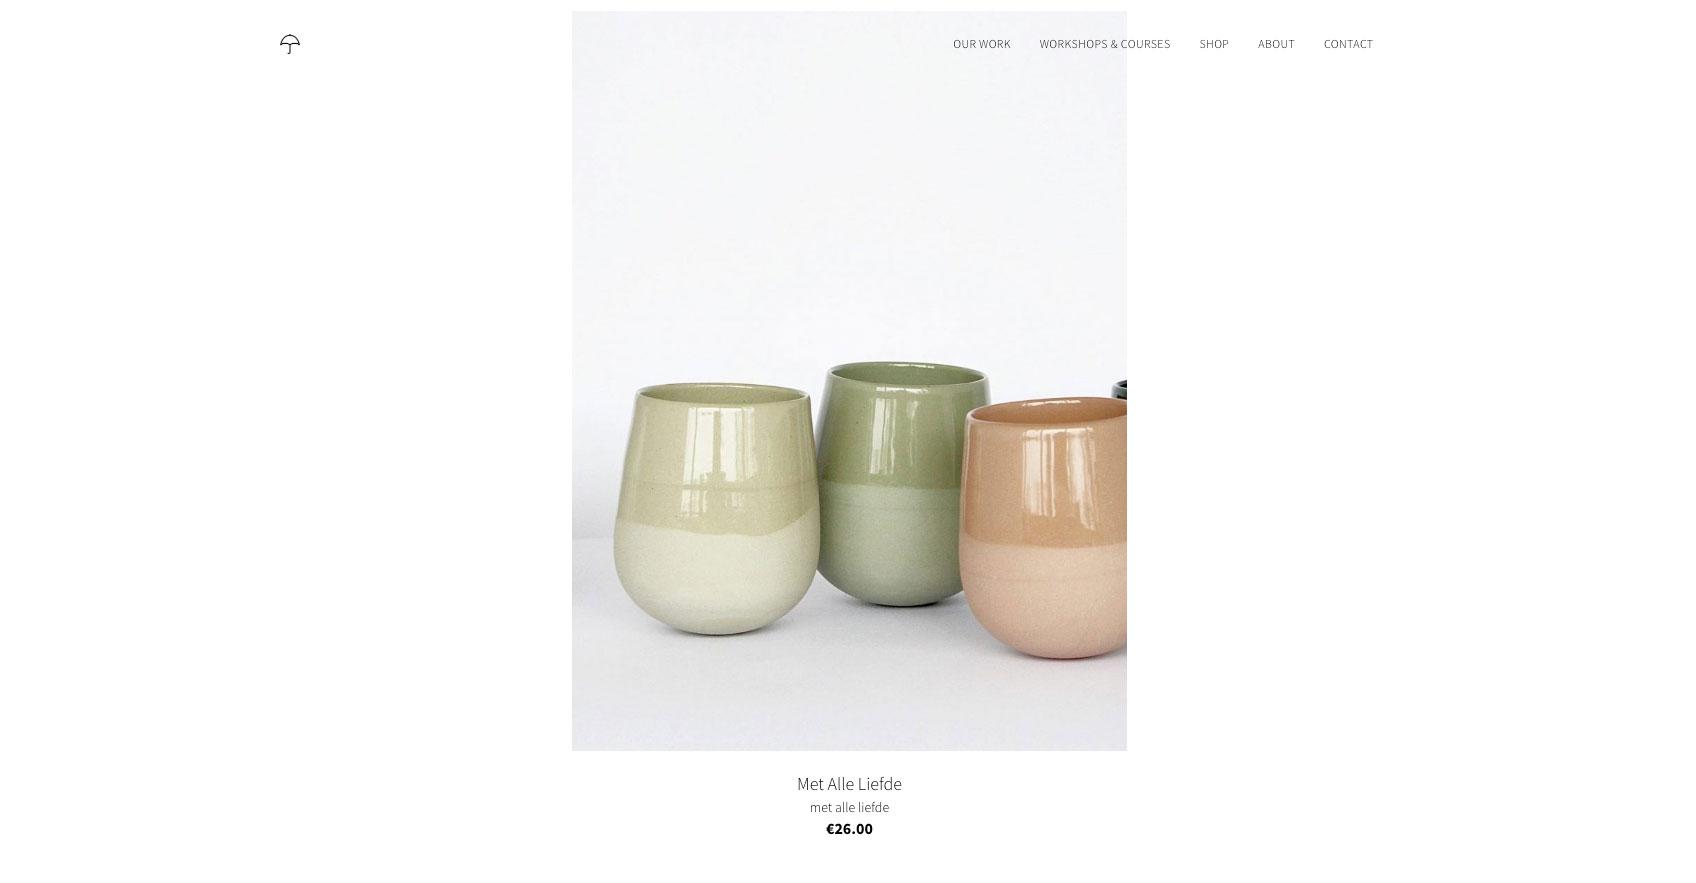 HUSK-Ceramics-project-Snugger-website